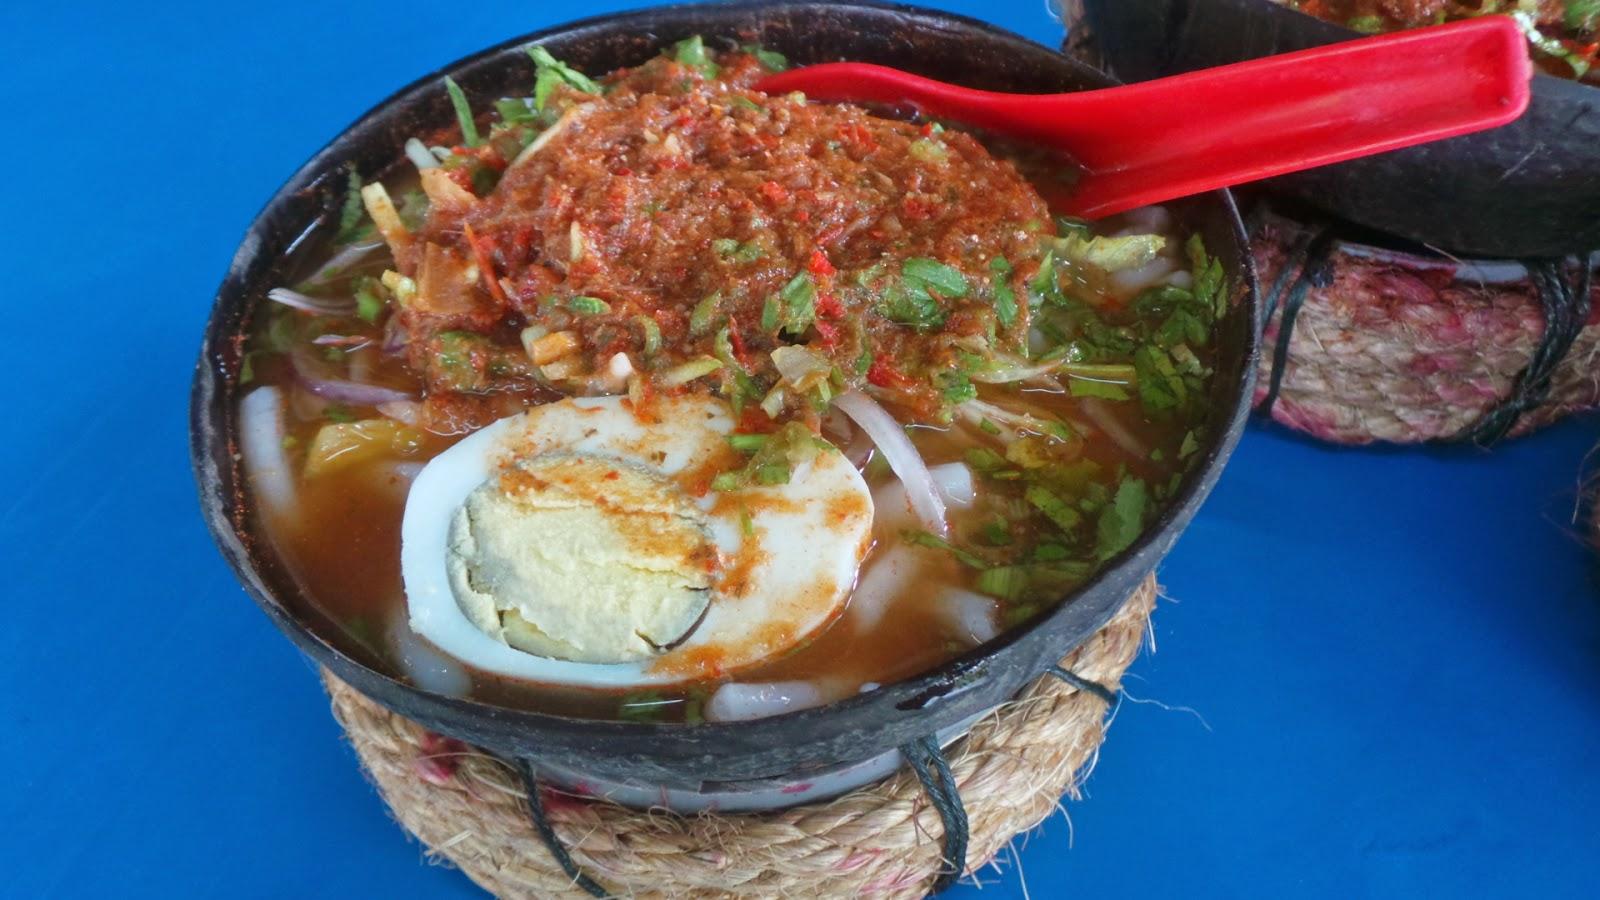 laksa penang  sedap  pulau pinang resepi laksa penang sedap wow resepi Resepi Laksa Penang Kelantan Enak dan Mudah